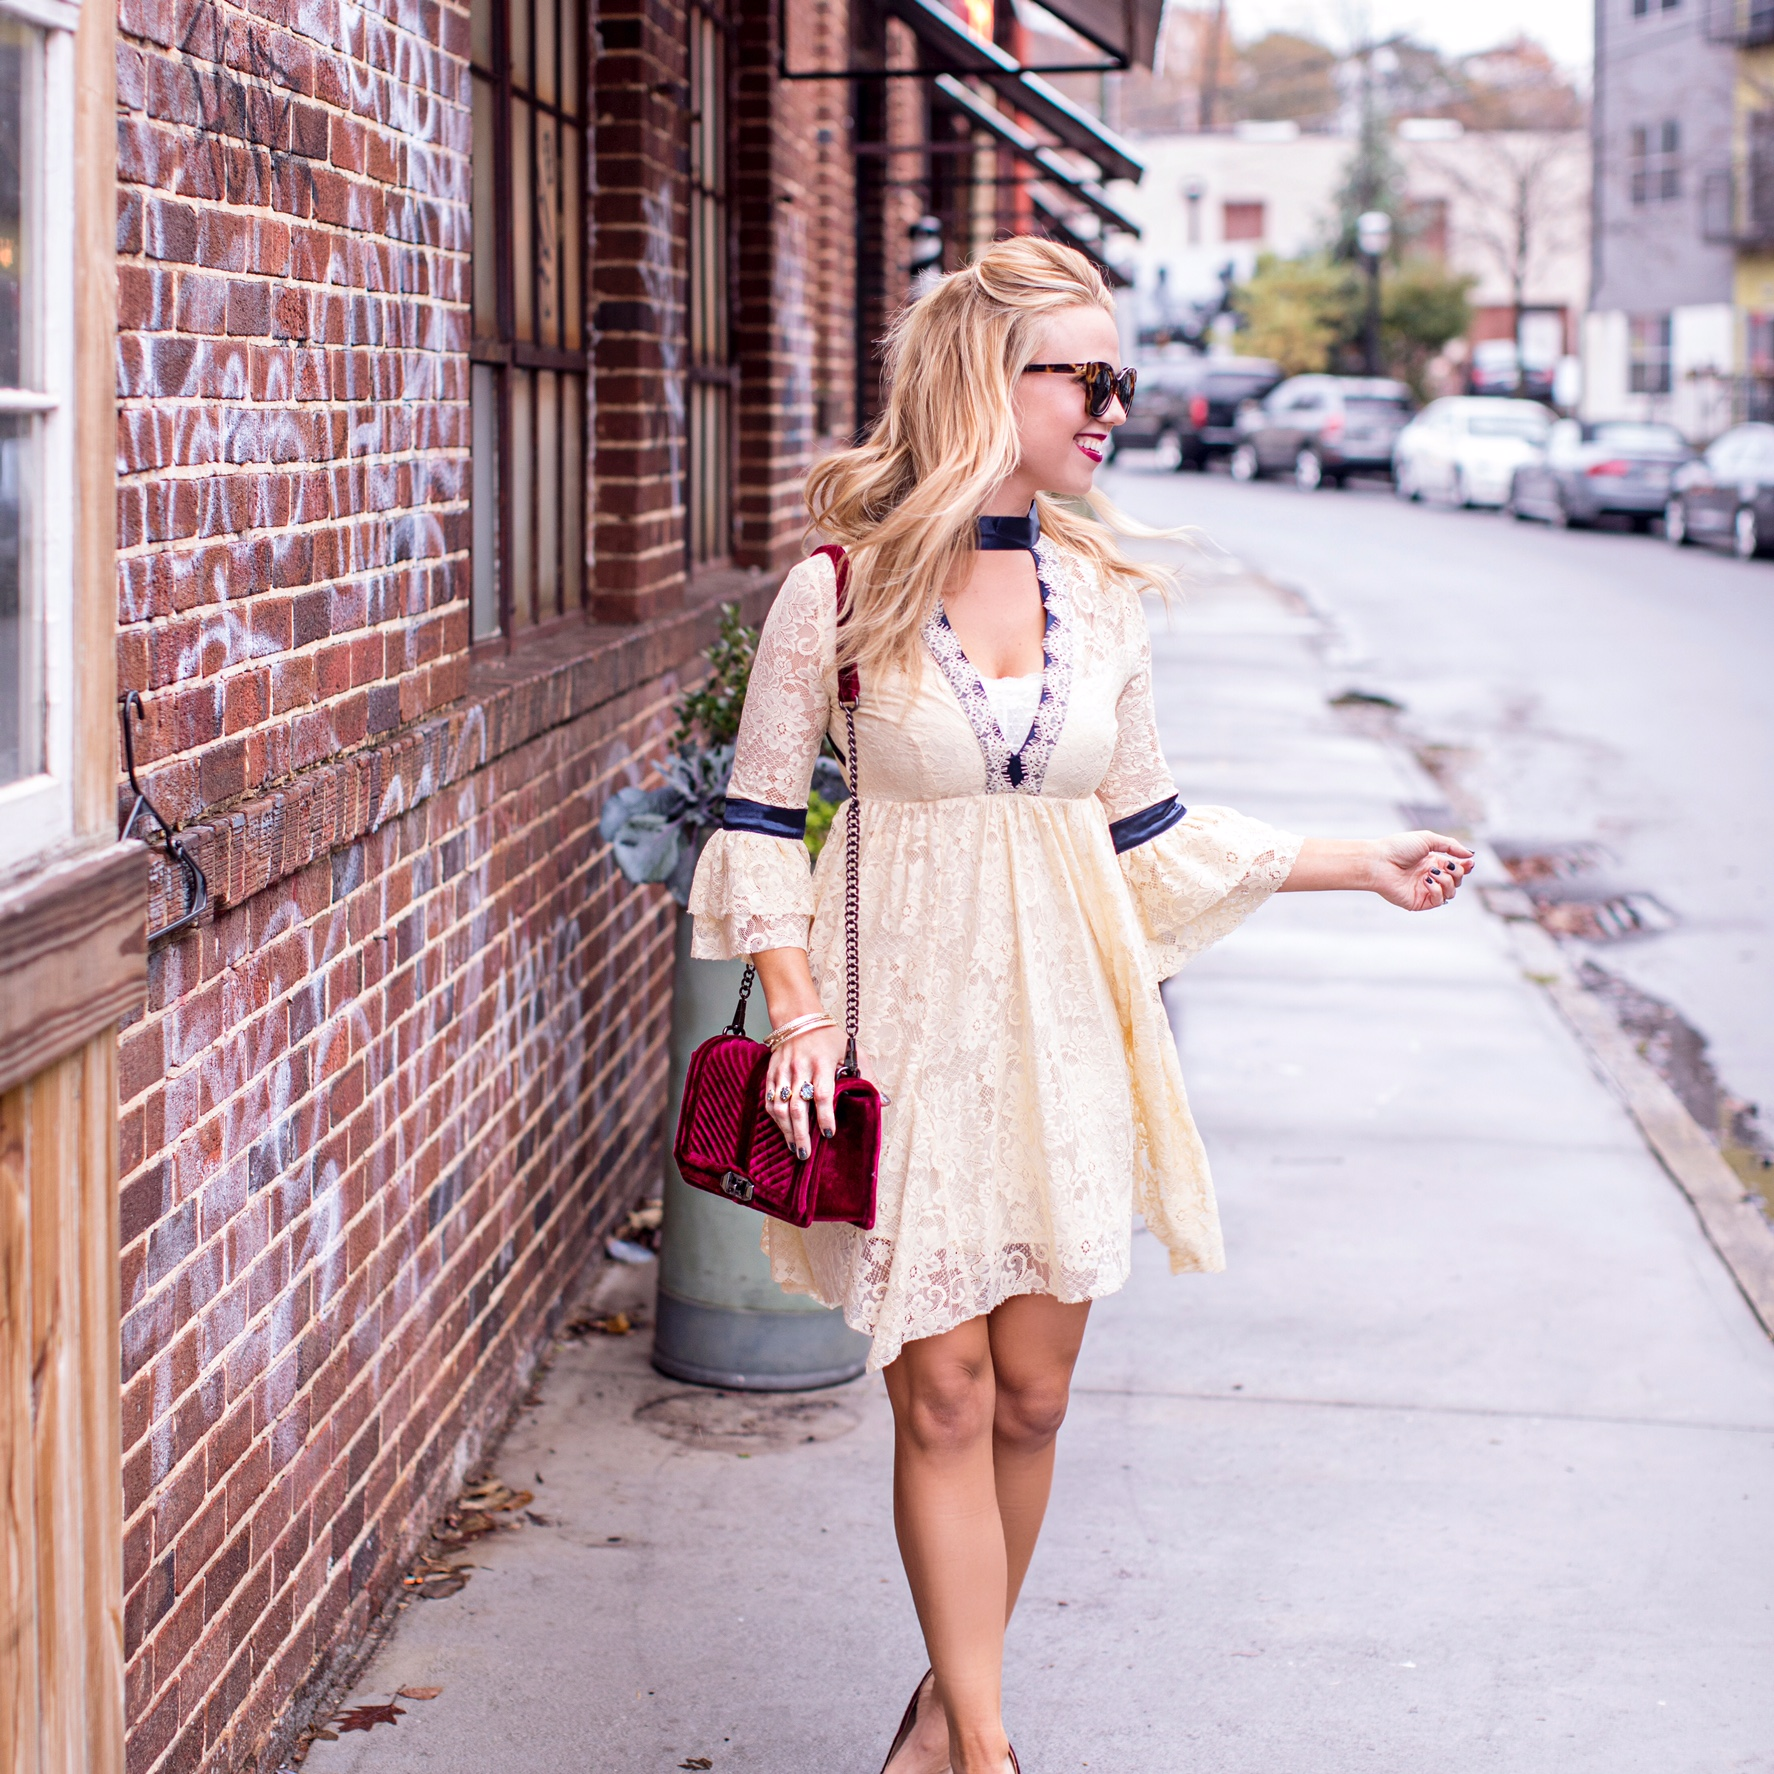 c726c35f0e69 Velvet and Lace — Atlanta Fashion Blogger - Edit by Lauren